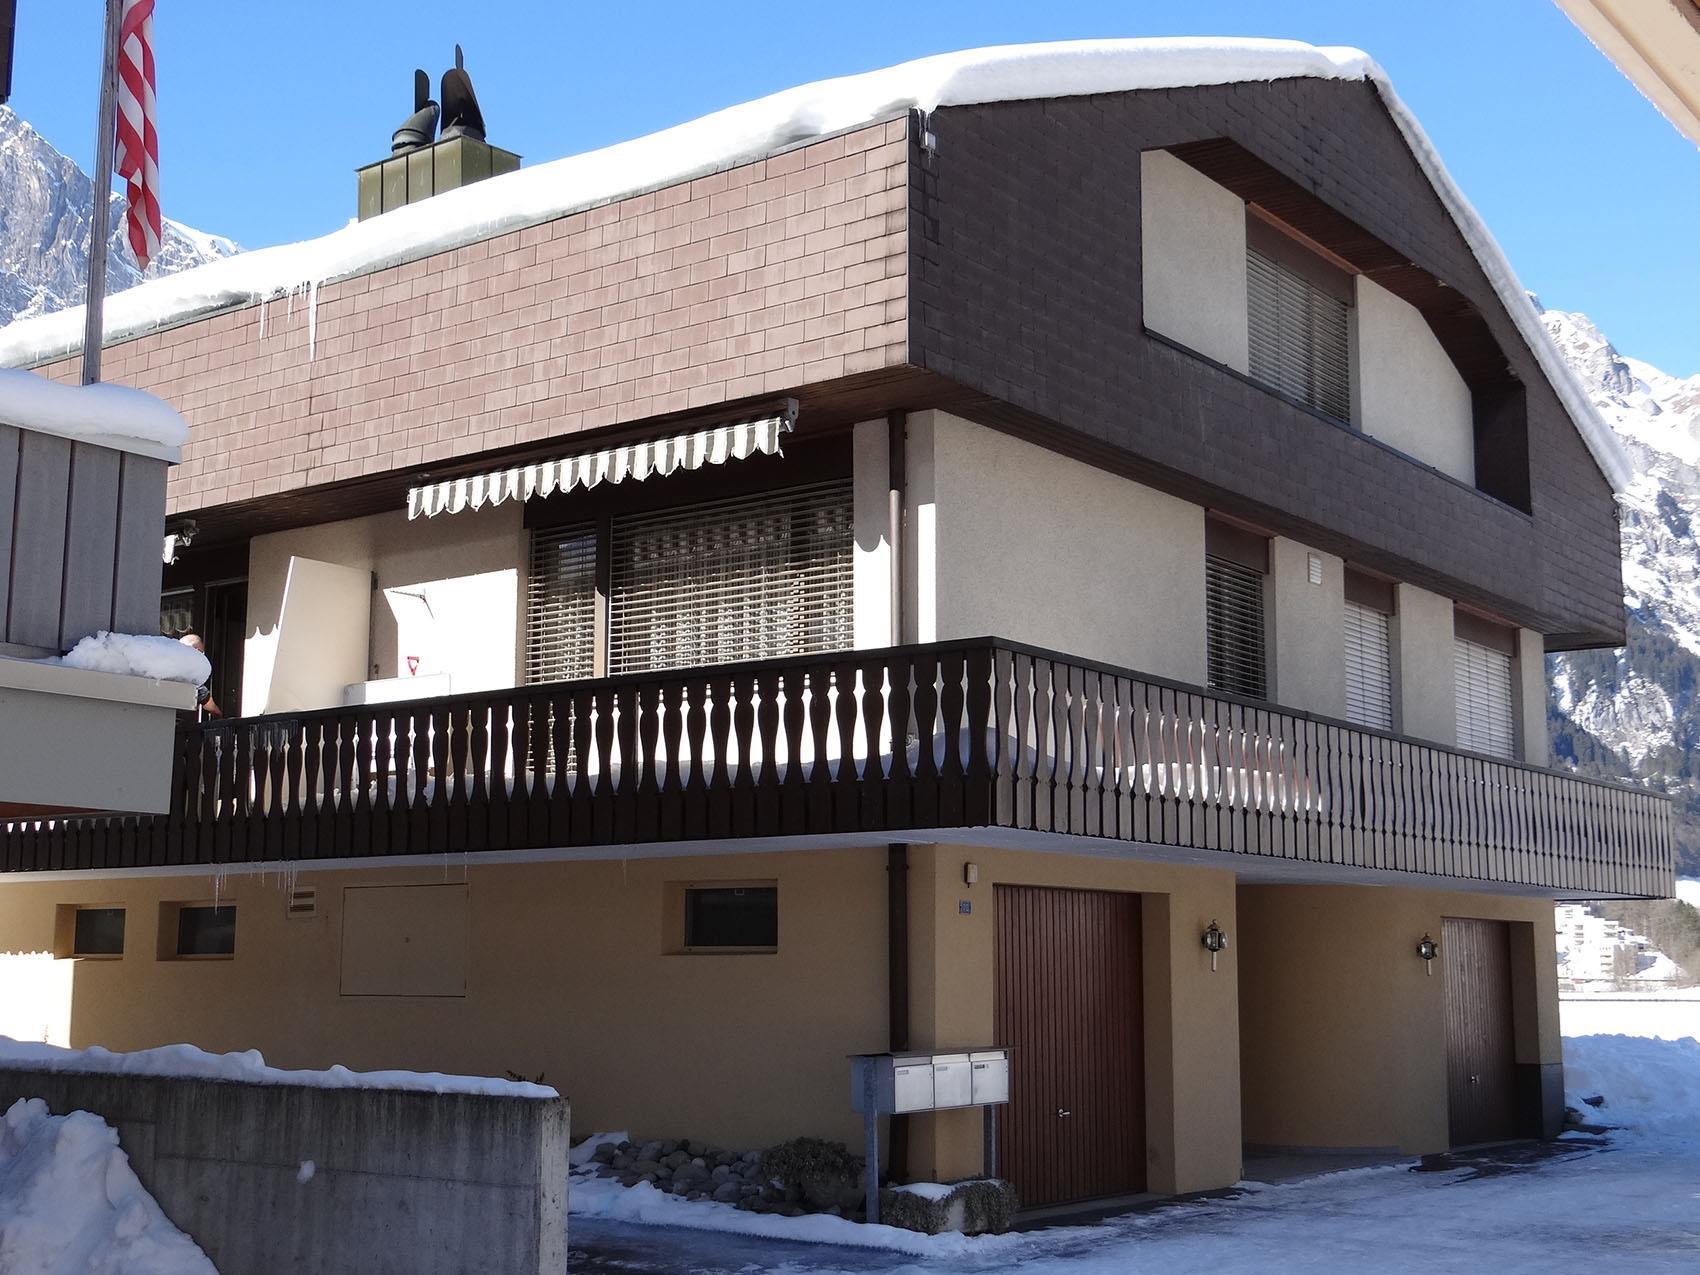 Engelberg, Switzerland holiday homes & apartments   Interhome